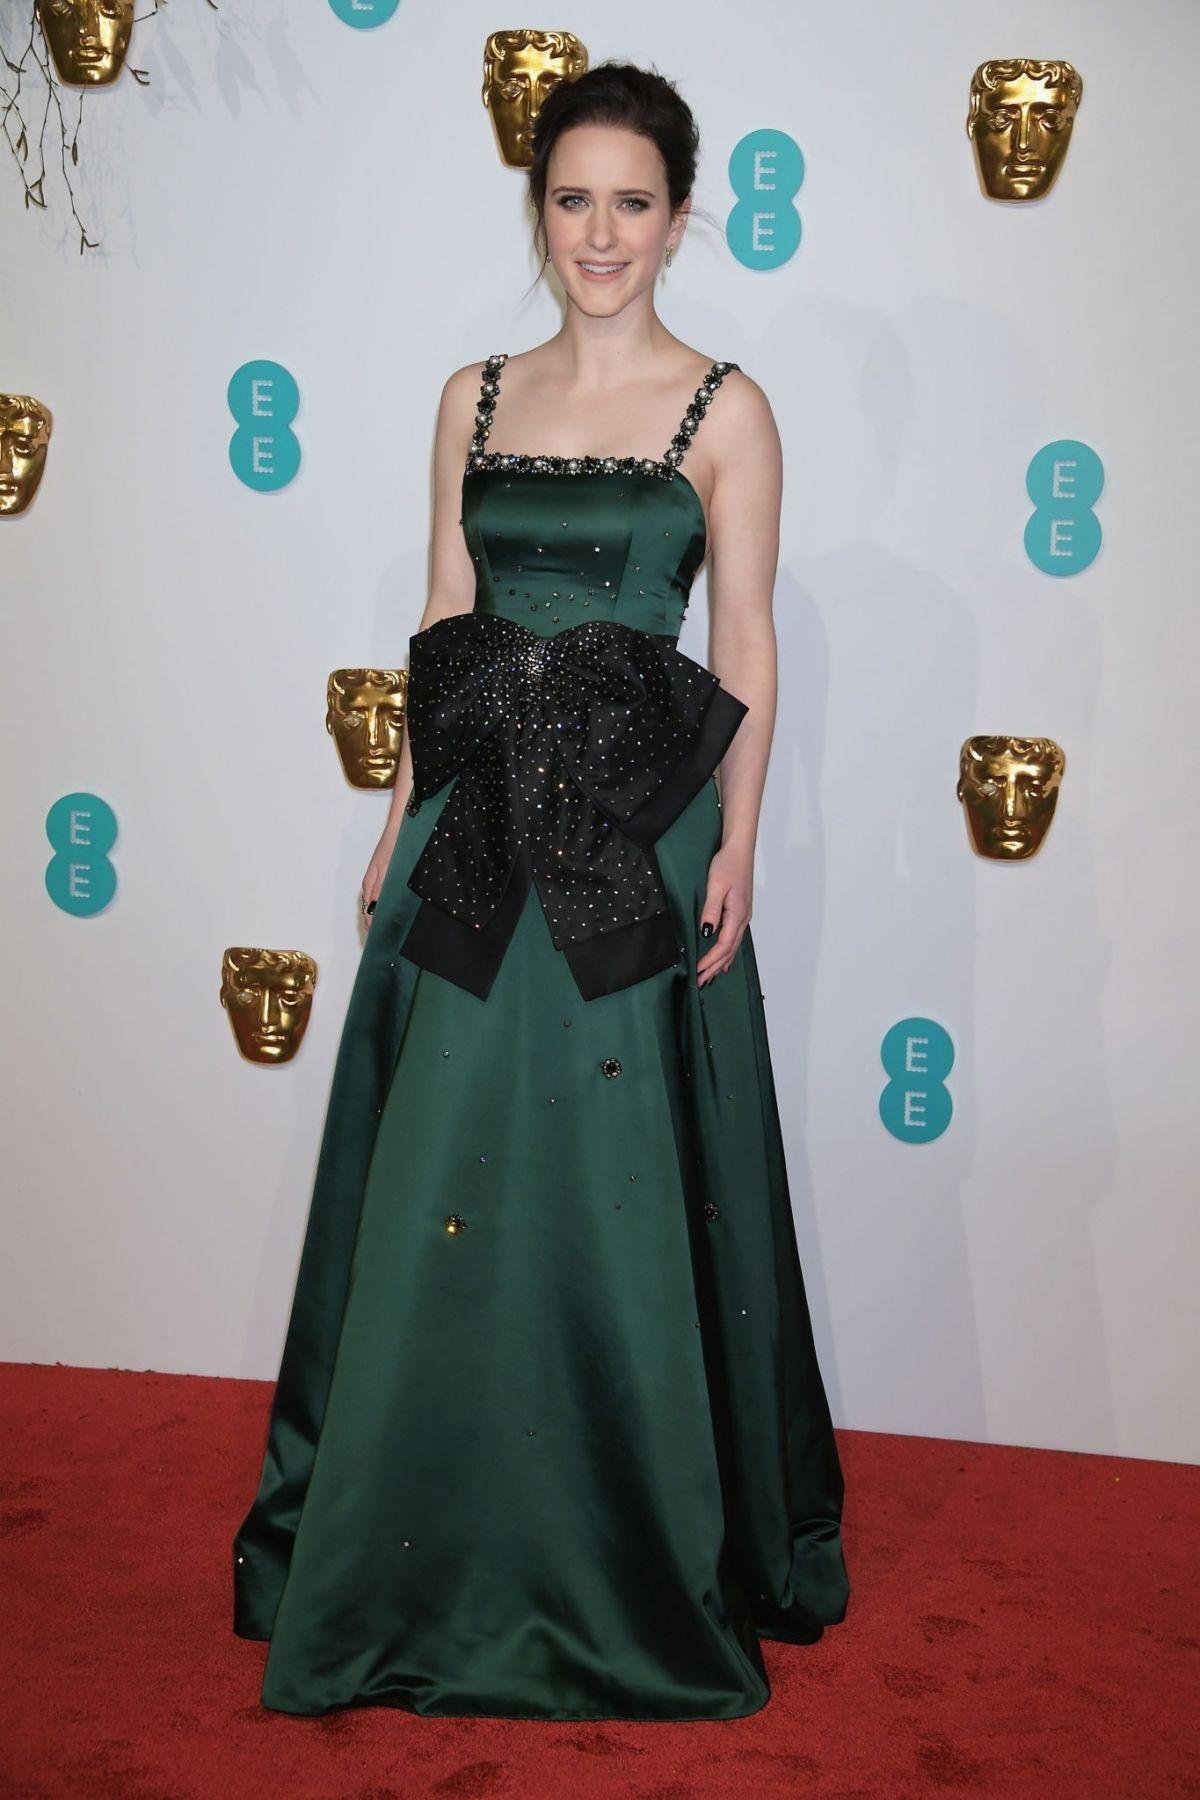 bafta awards 2019 - photo #9